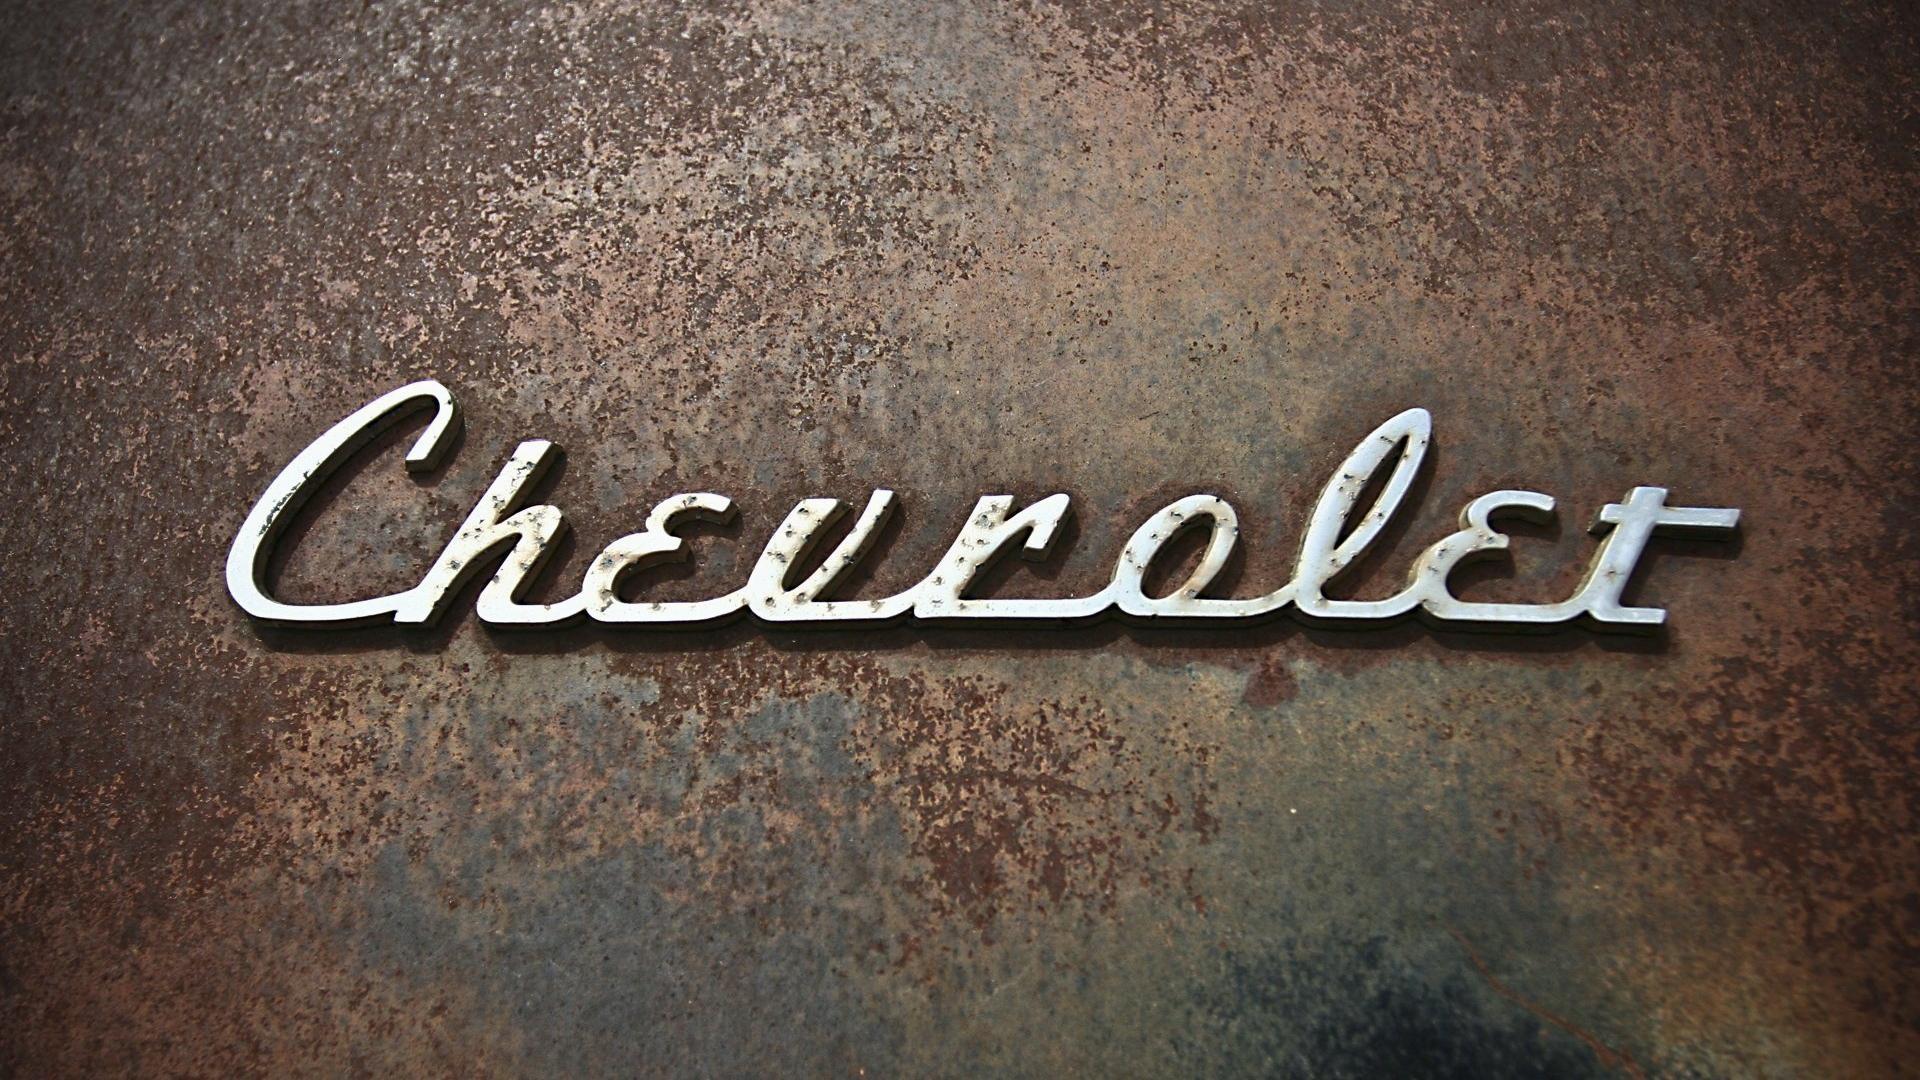 Chevy Truck Iphone Wallpaper Chevy Silverado Iphone Wallpaper